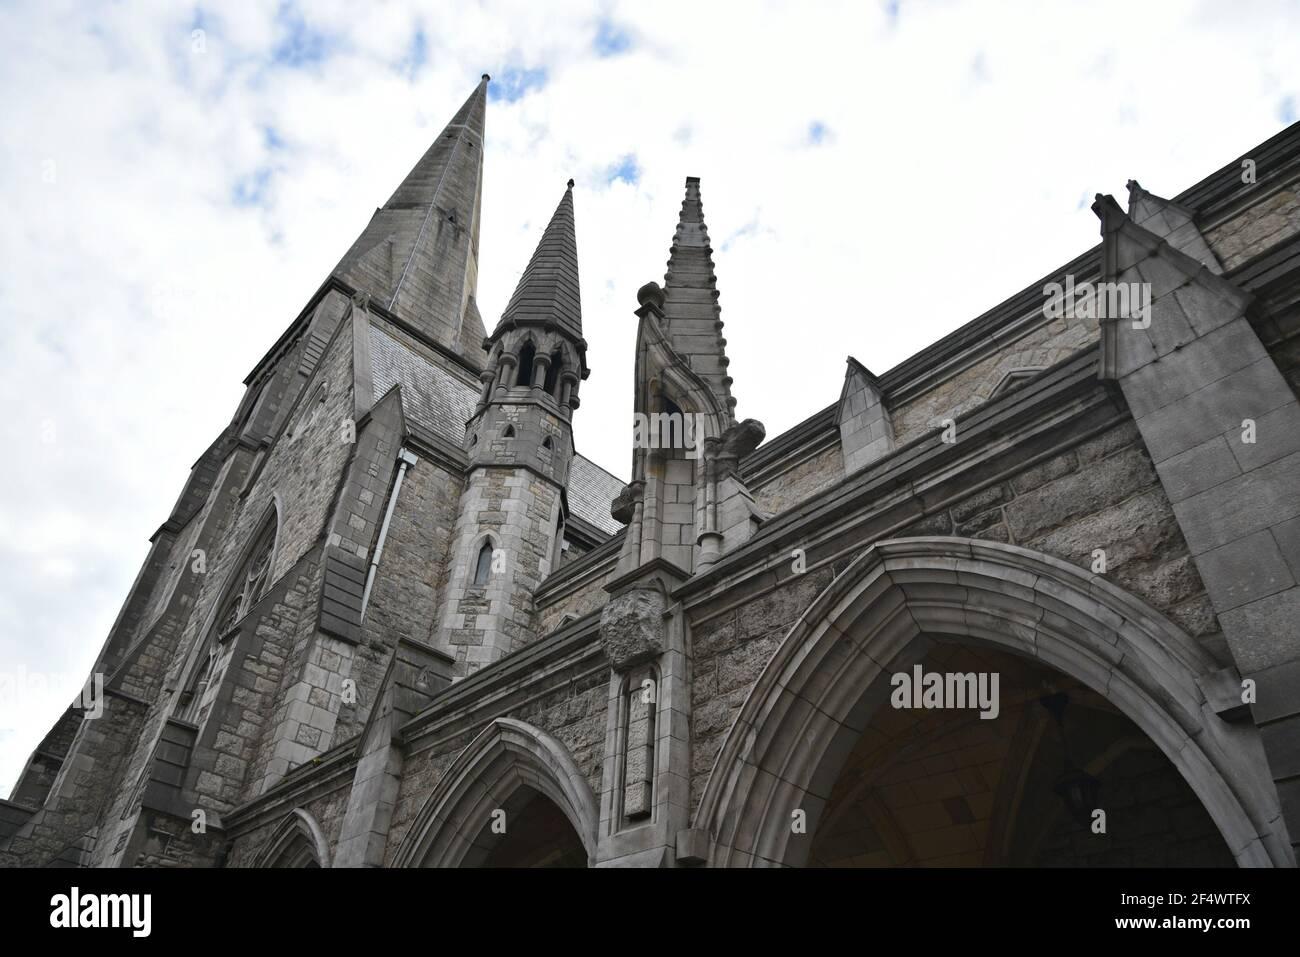 Antica chiesa gotica facciata in pietra a Dublino, Irlanda. Foto Stock